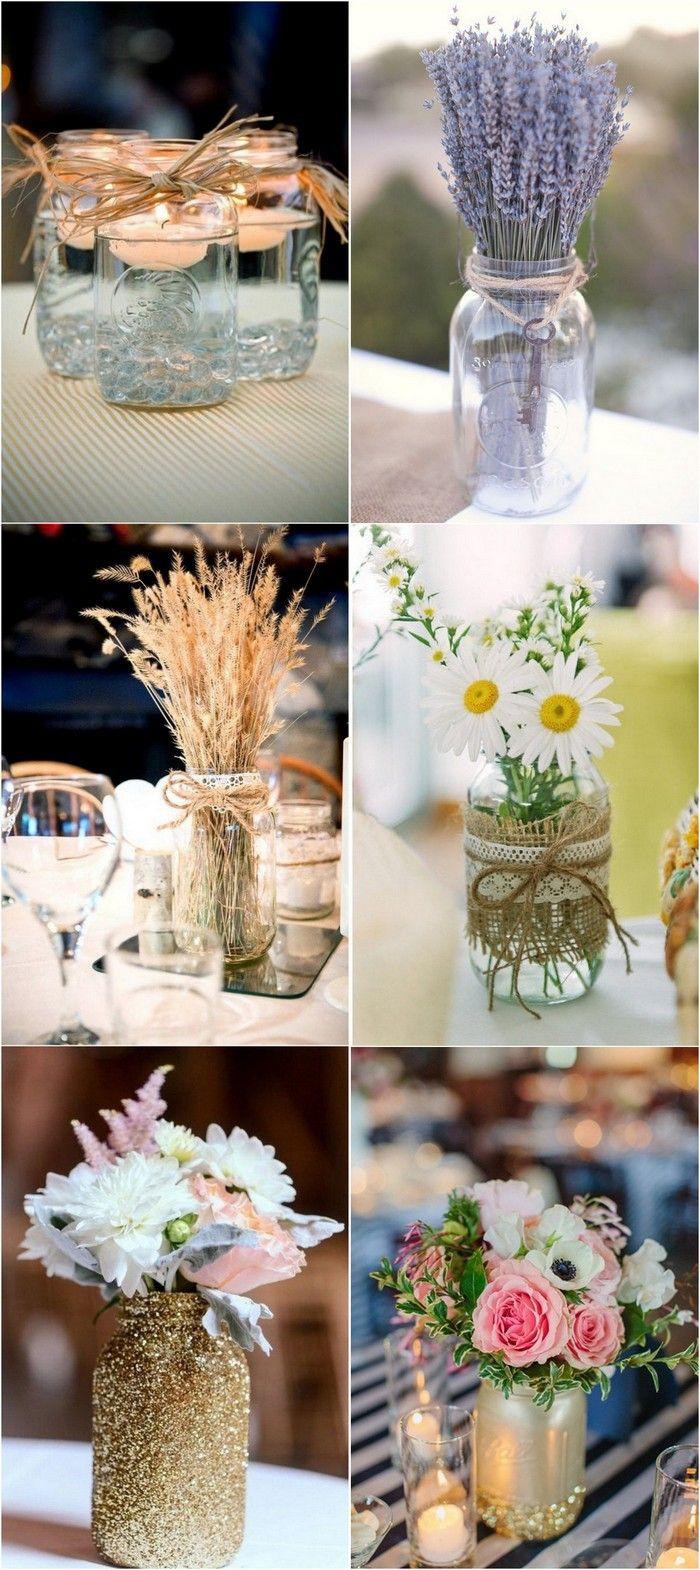 mason jars wedding centerpieces #weddingdecor #weddingideas  #weddingcenterpiece #weddingreception